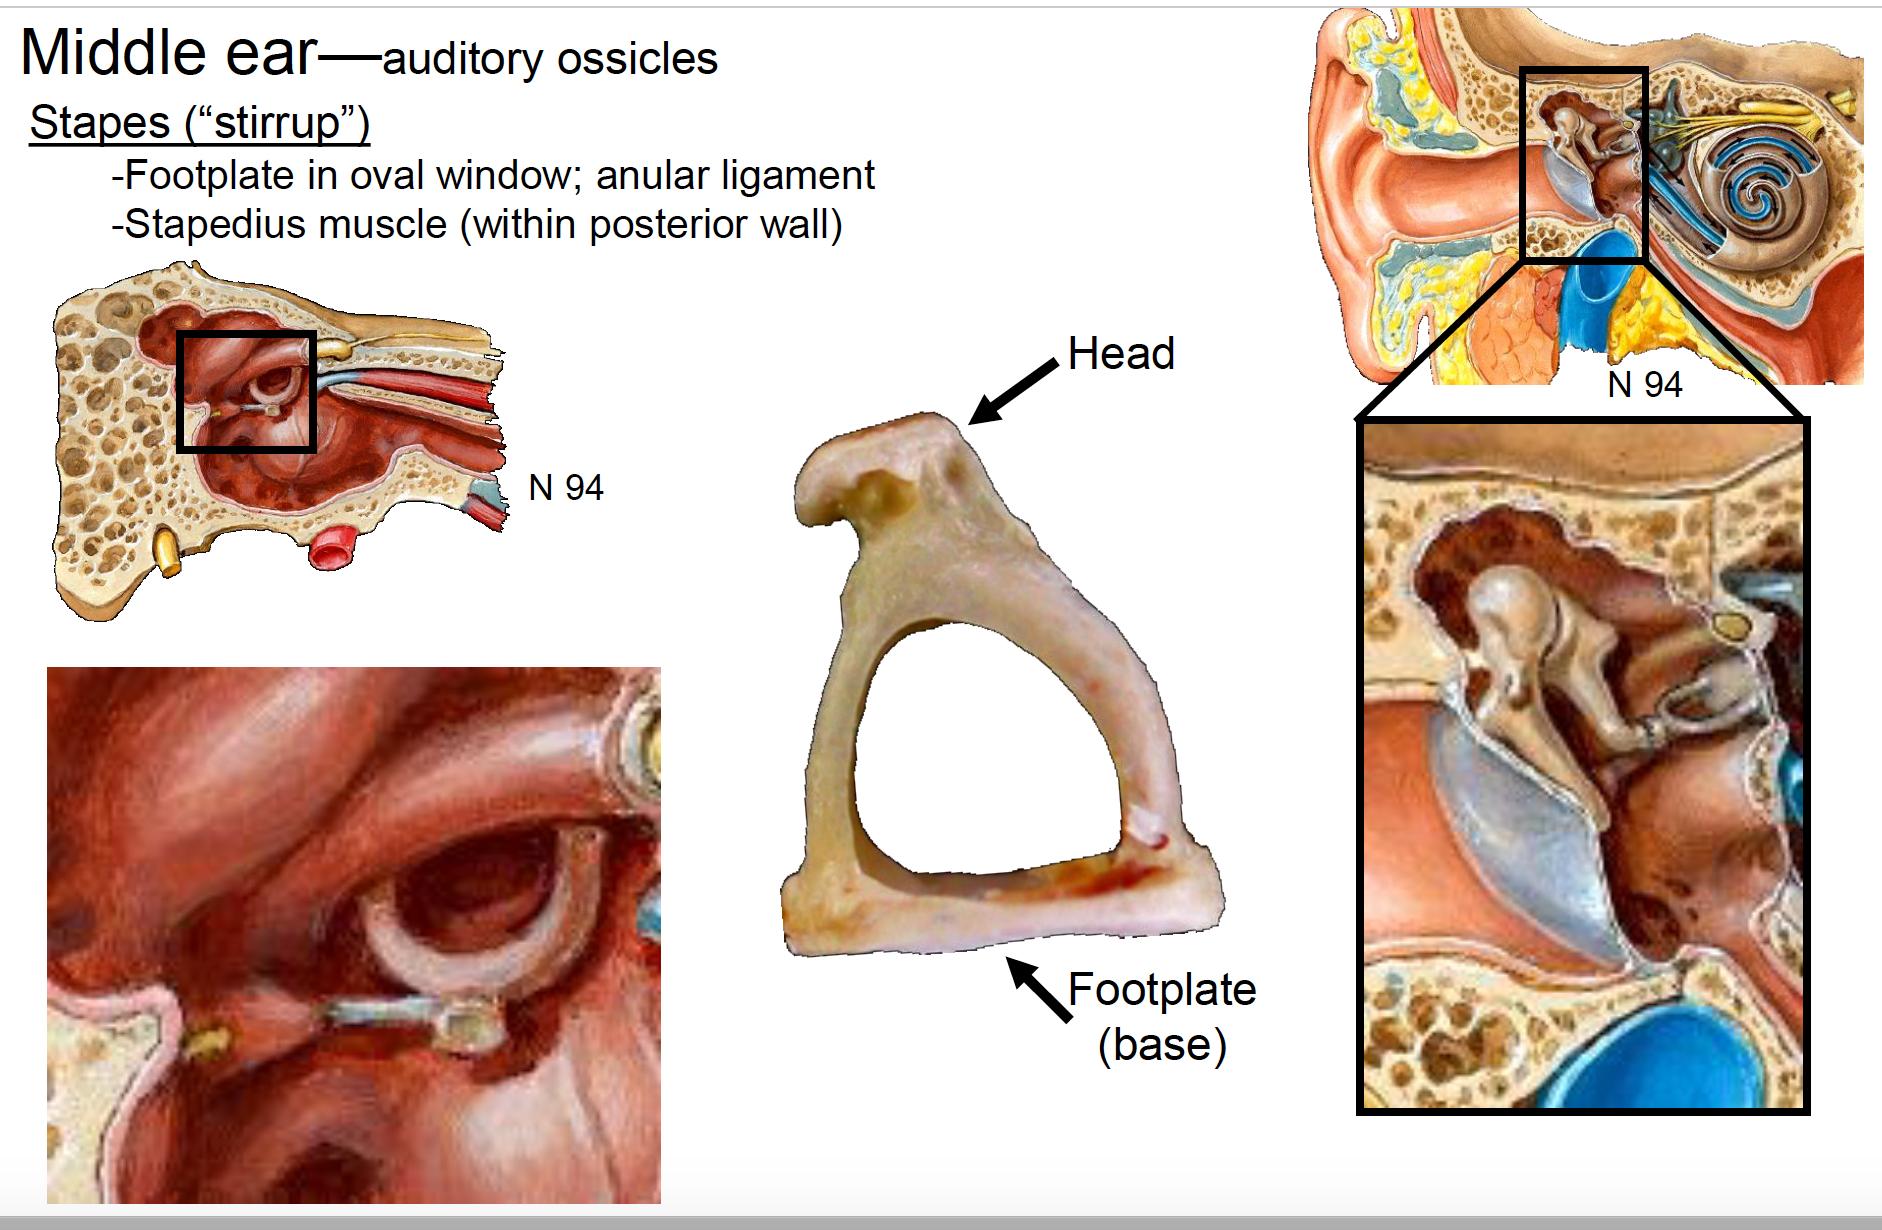 Anatomy G67 Ears Anatomy Unit 8 Flashcards Memorang